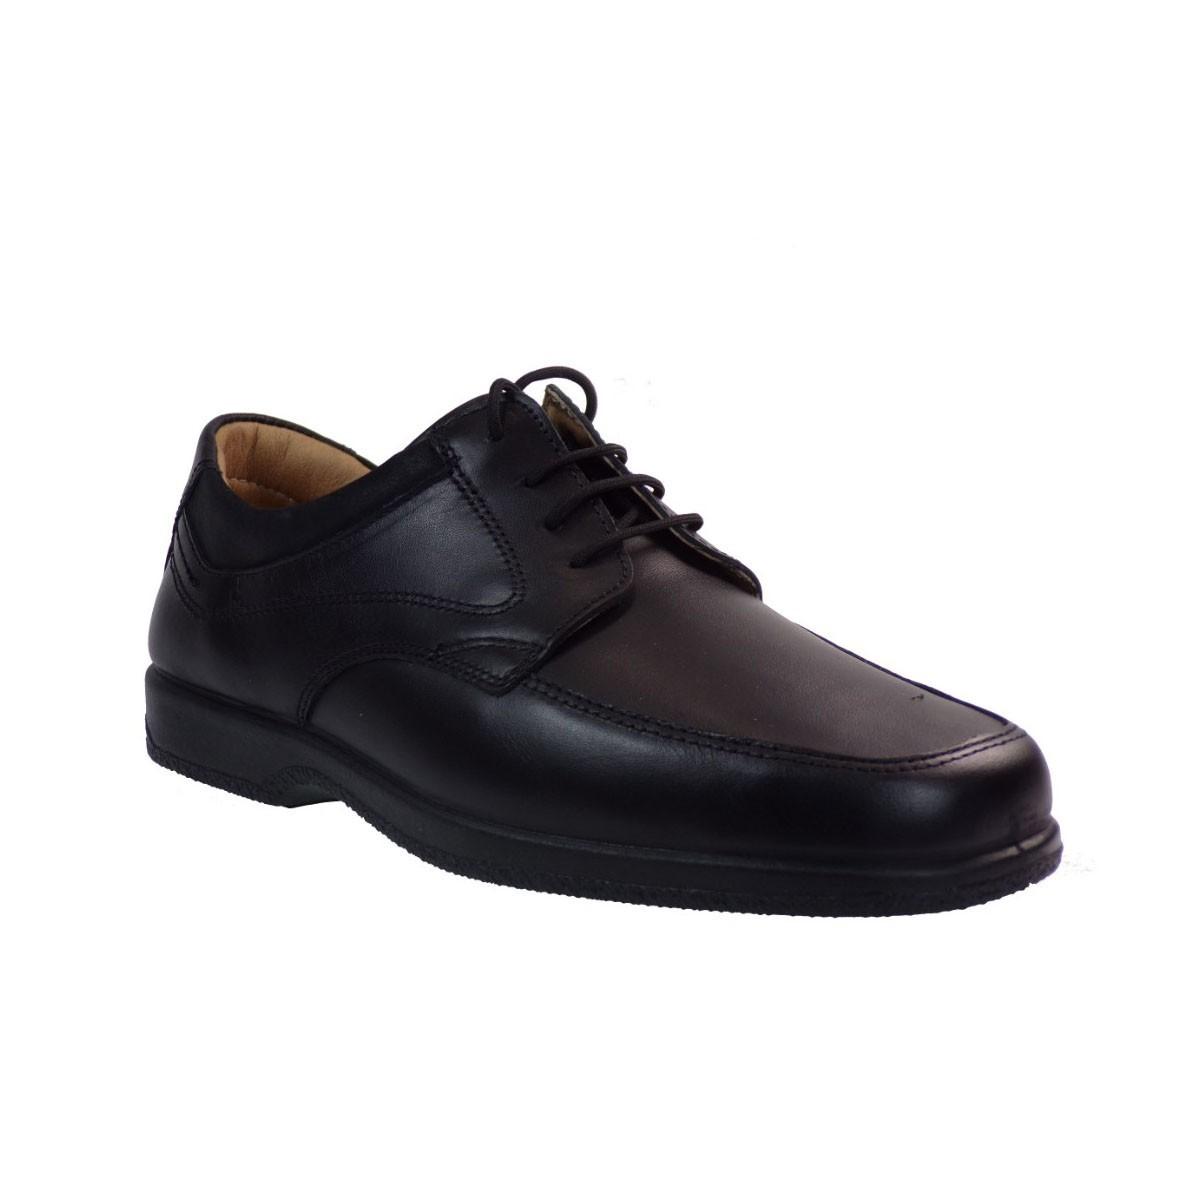 Aeropelma Duetto Ανδρικά Παπούτσια 390 Μαύρο